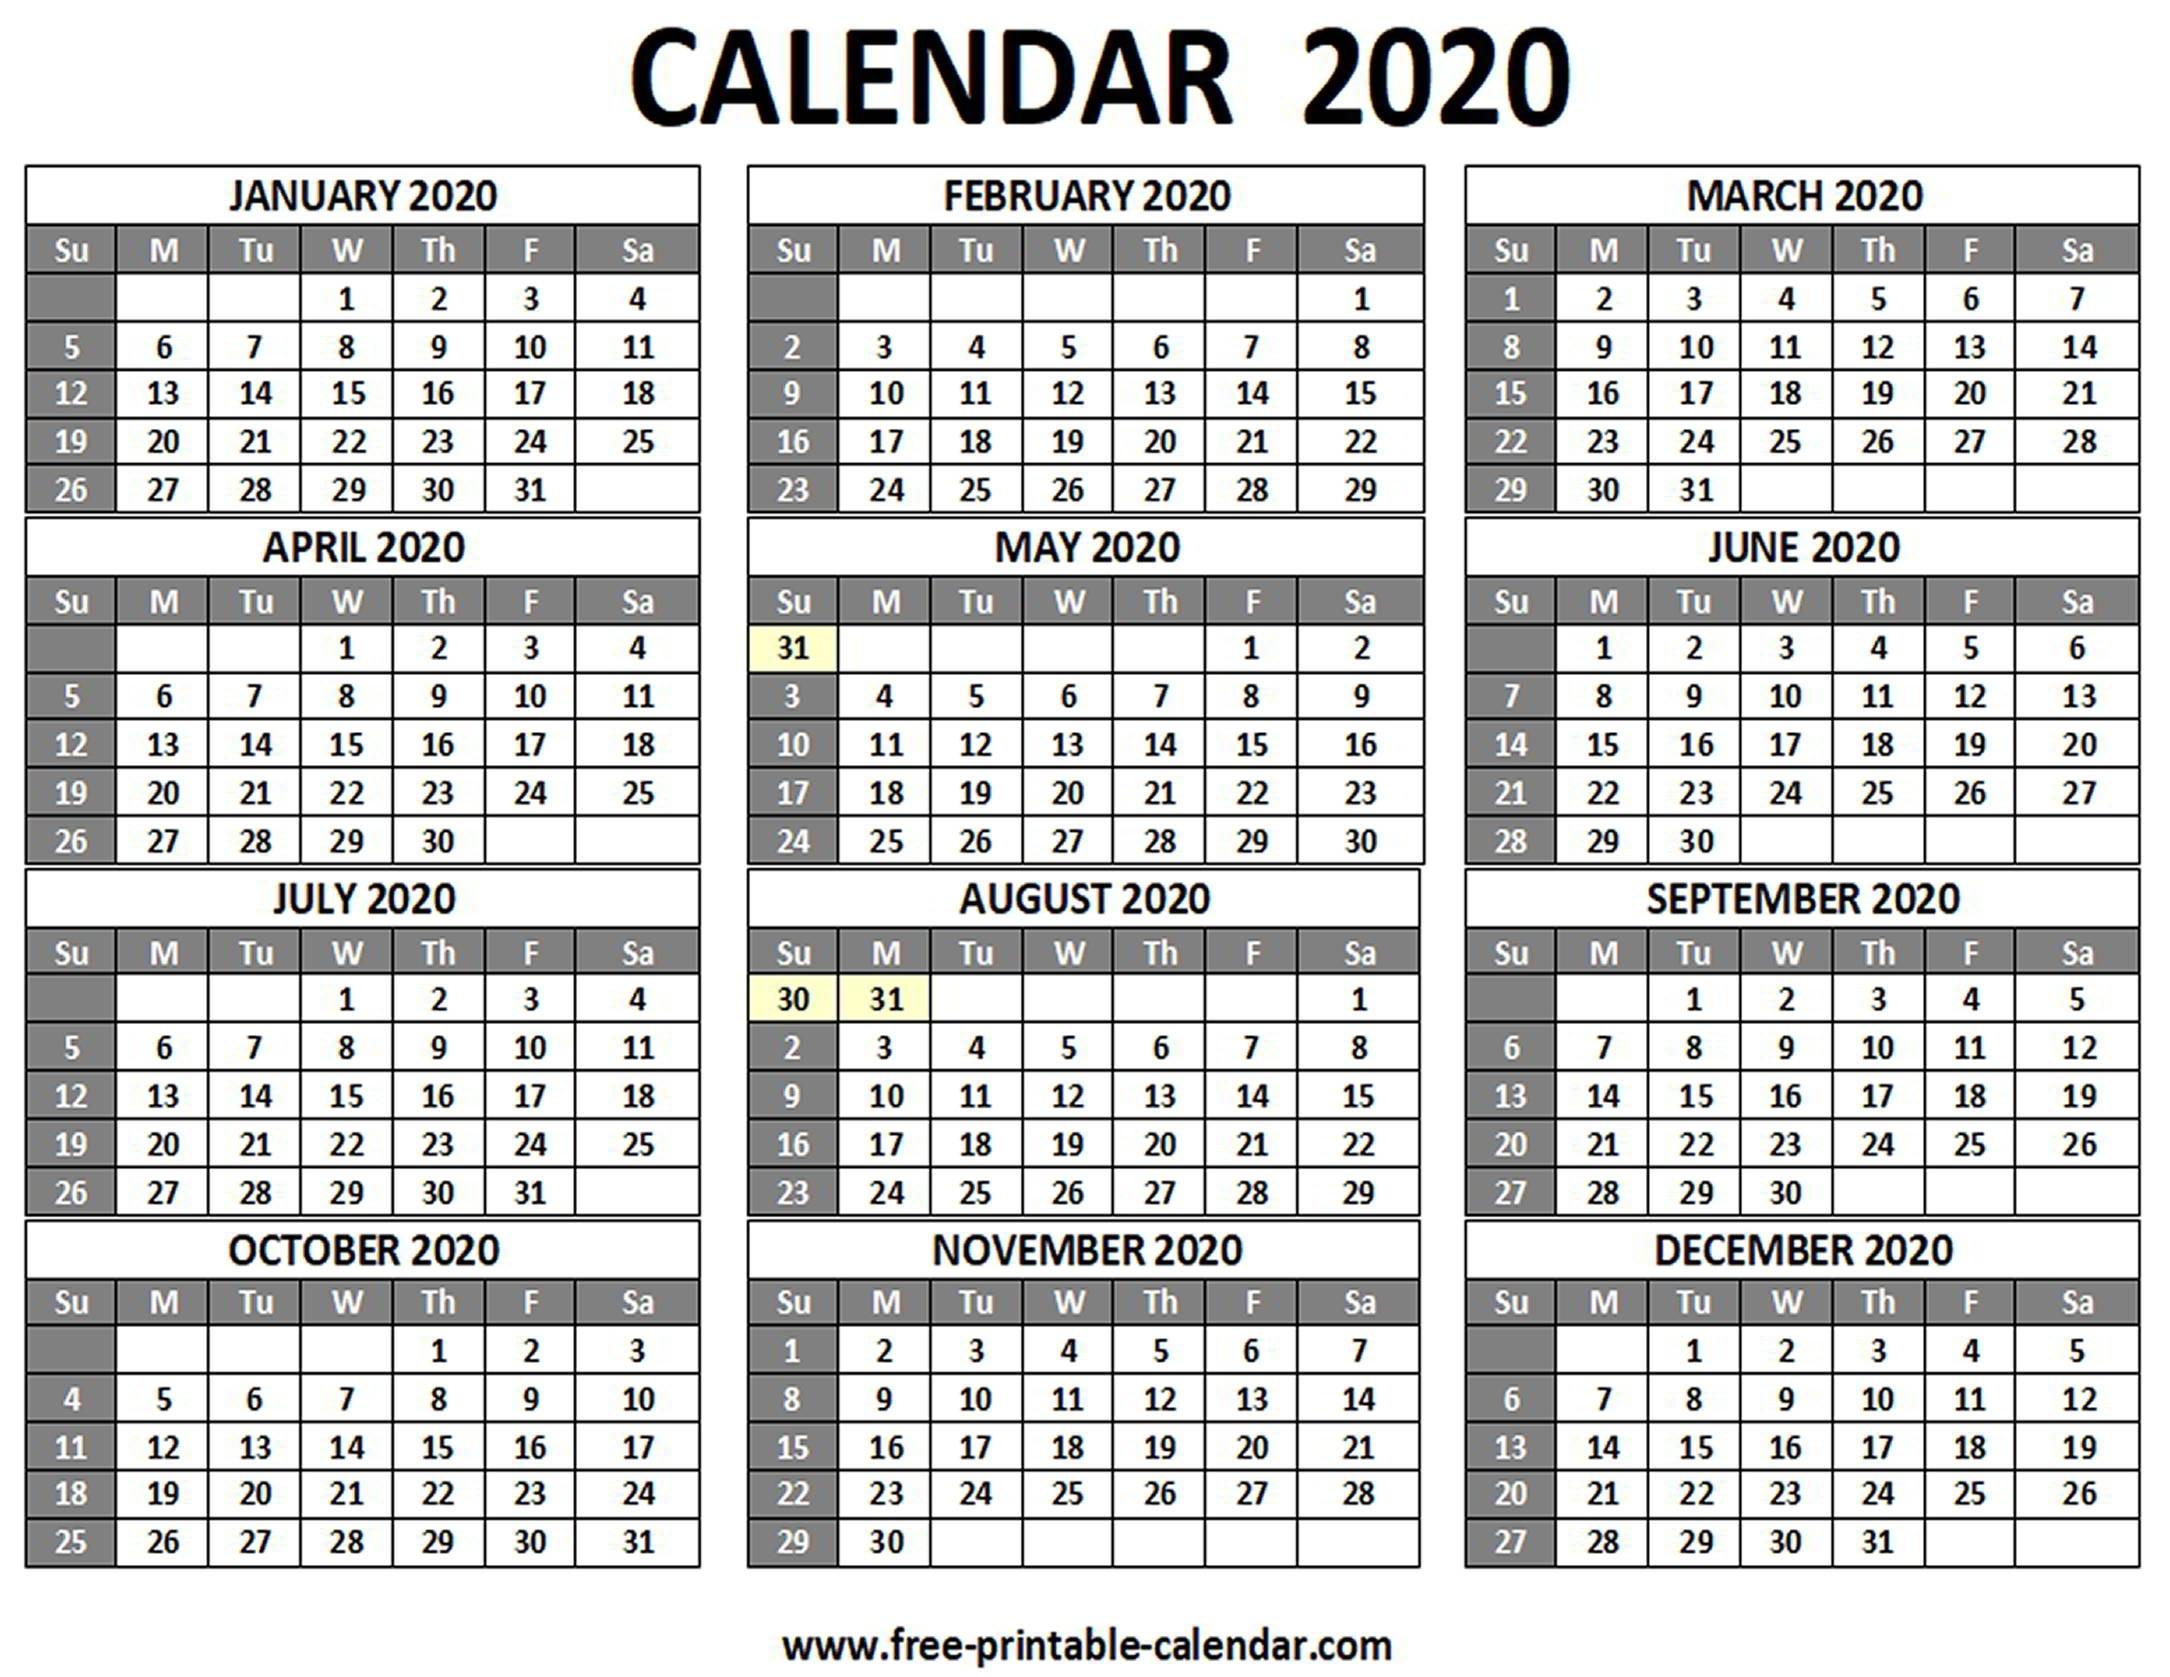 Printable 2020 Calendar - Free-Printable-Calendar  Full Page Printable 2020 Calendar